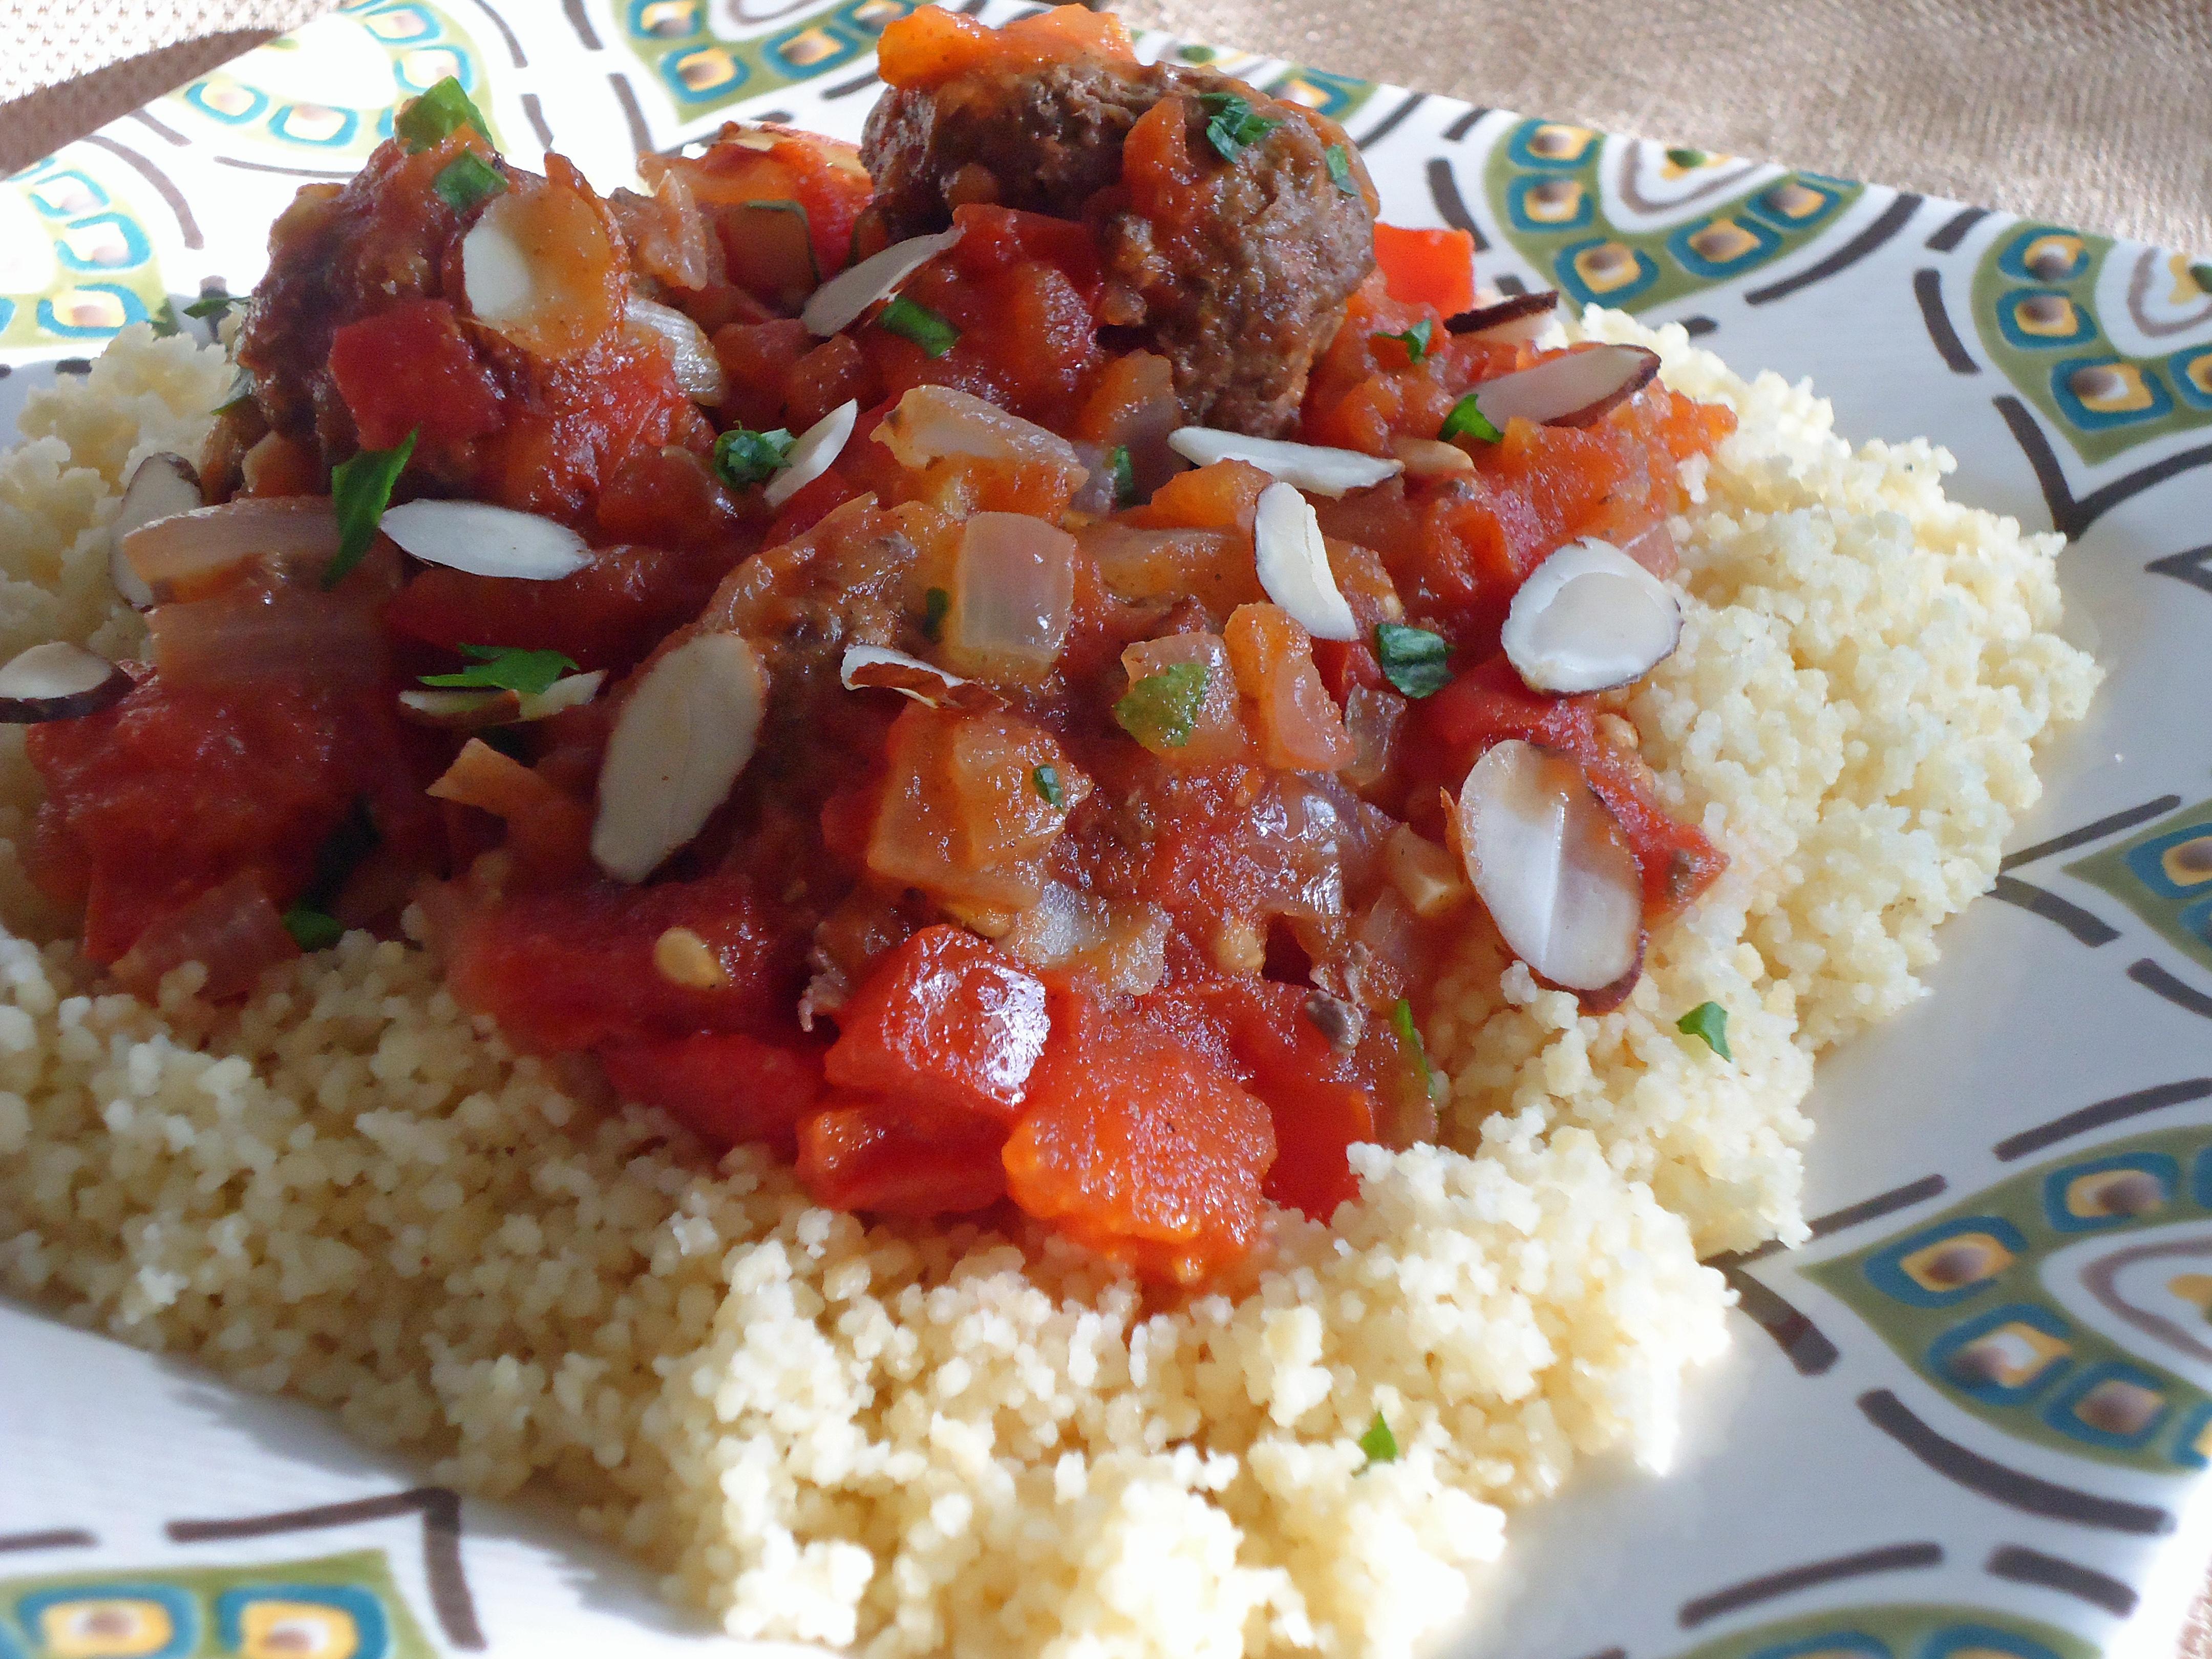 Kefta (Moroccan Meatballs)